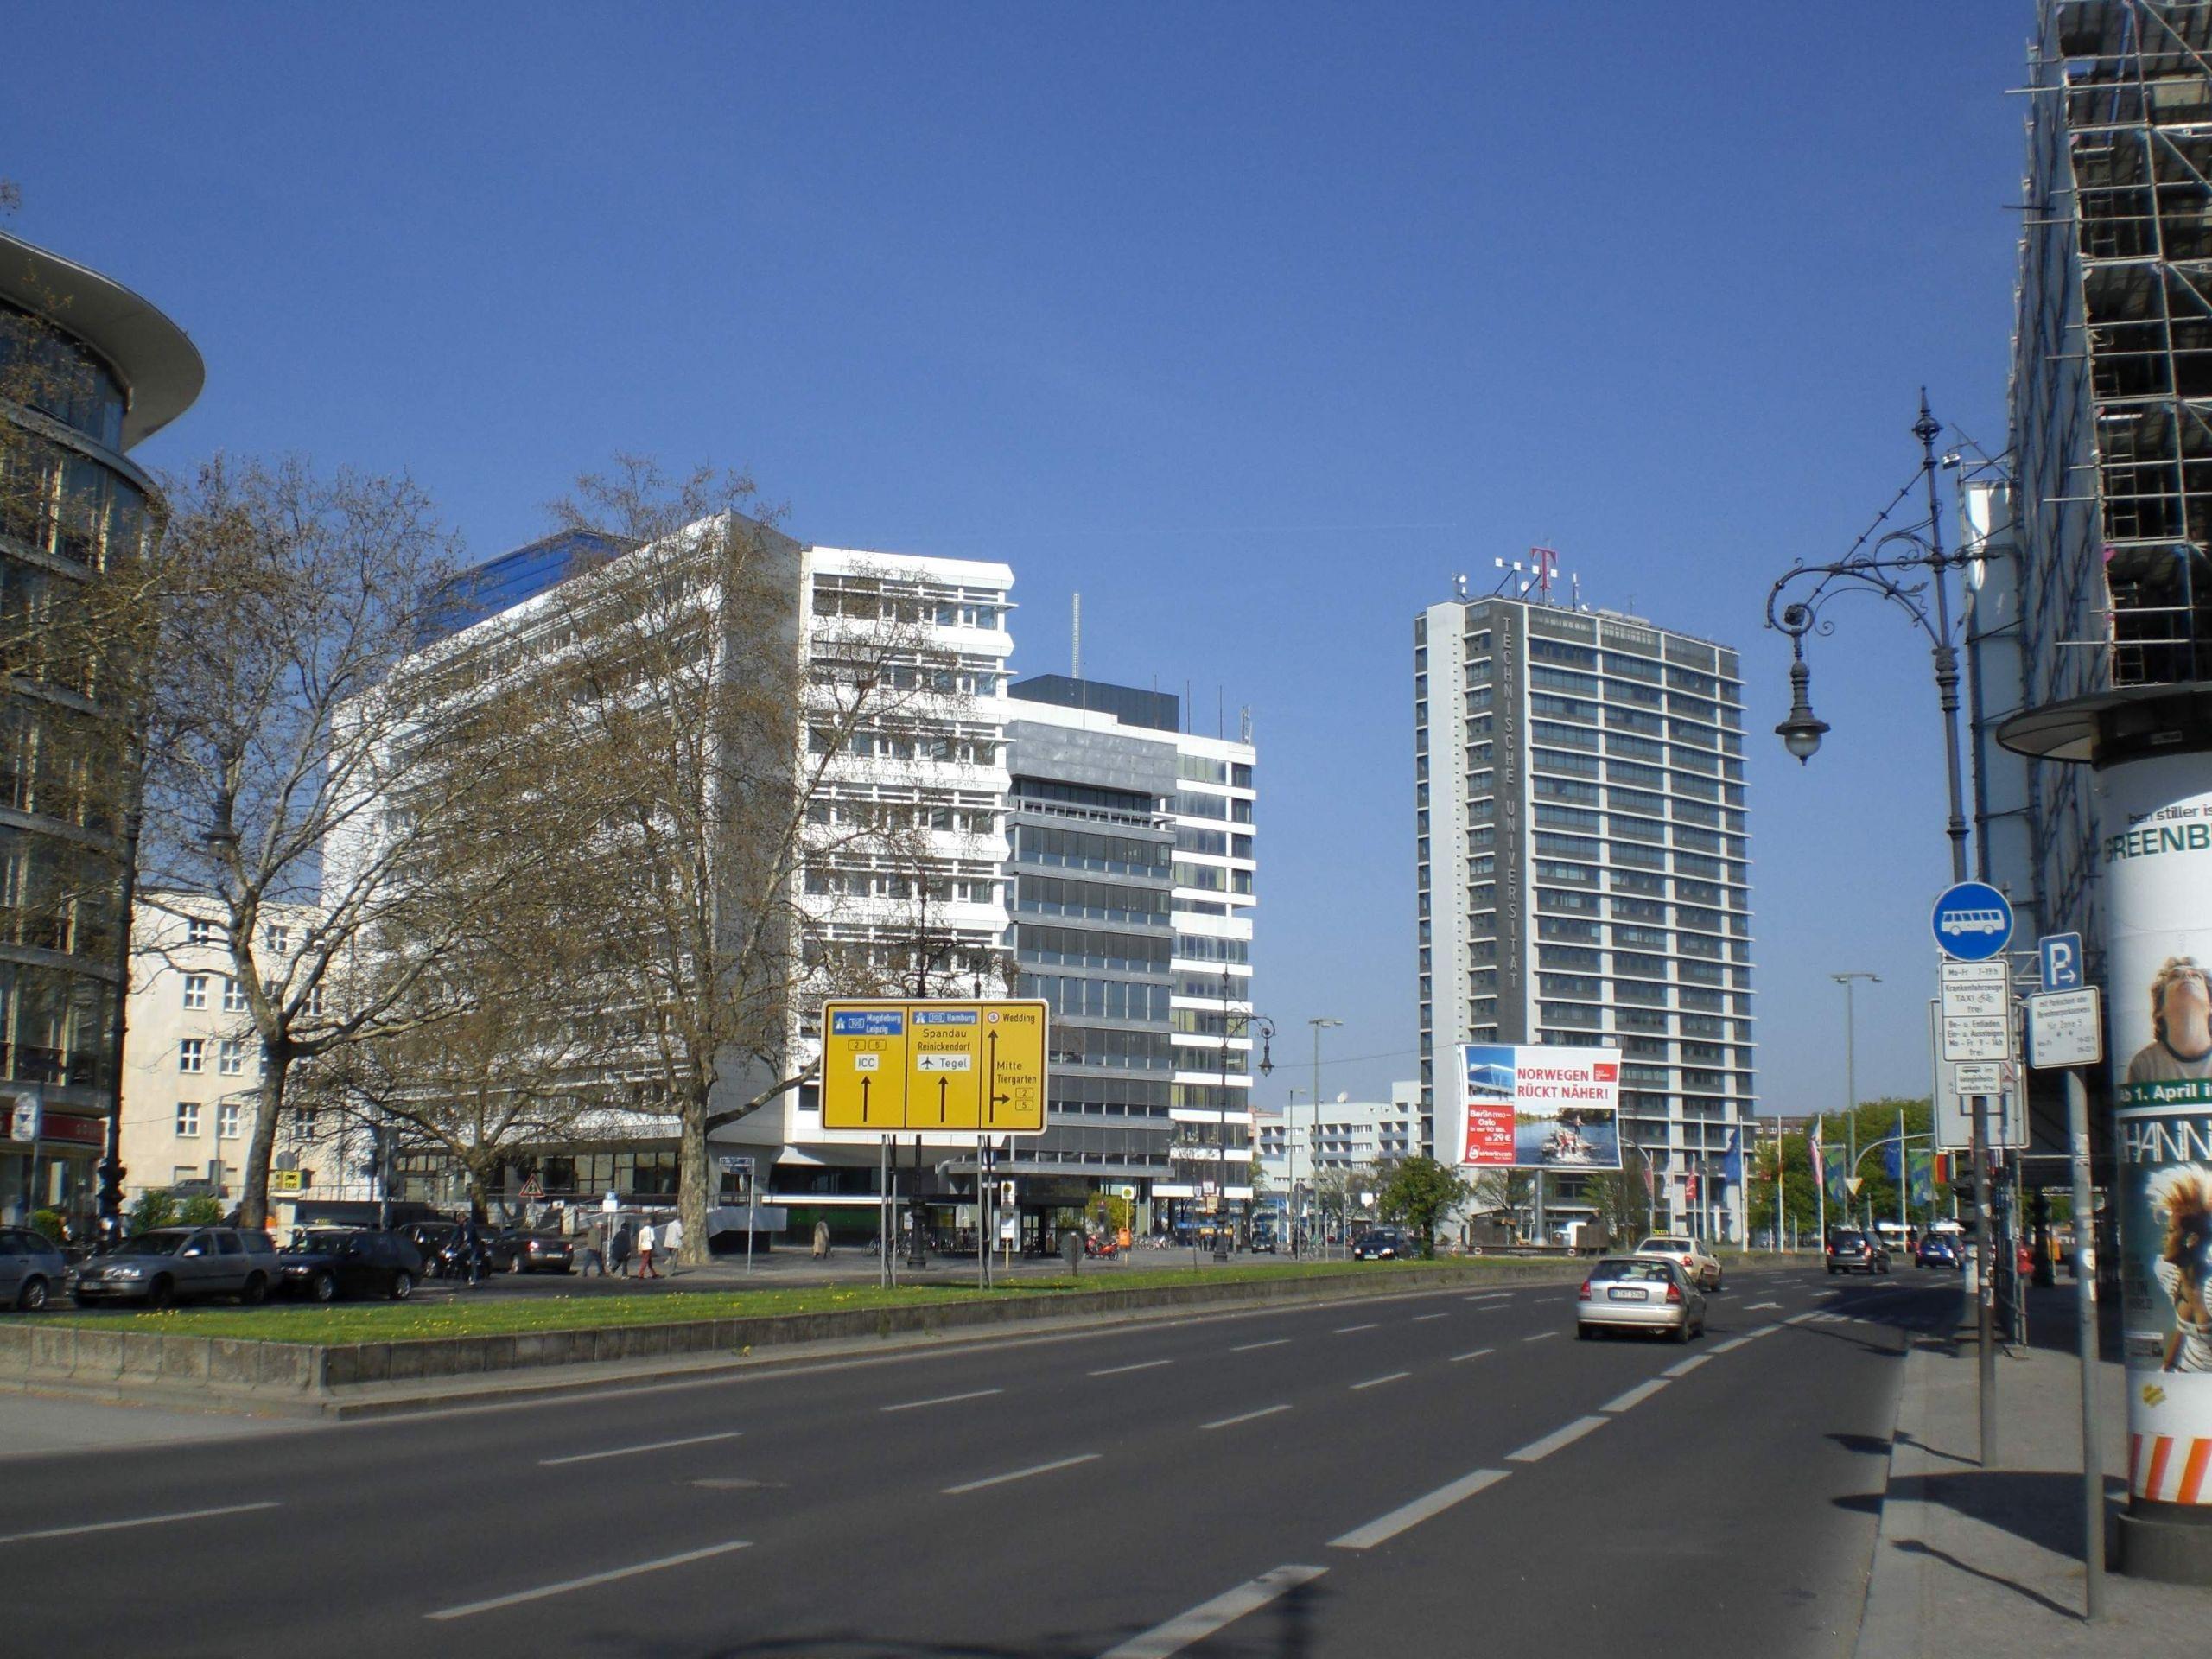 Charlottenburg Hardenbergstraße Ernst Reuter Platz JPG